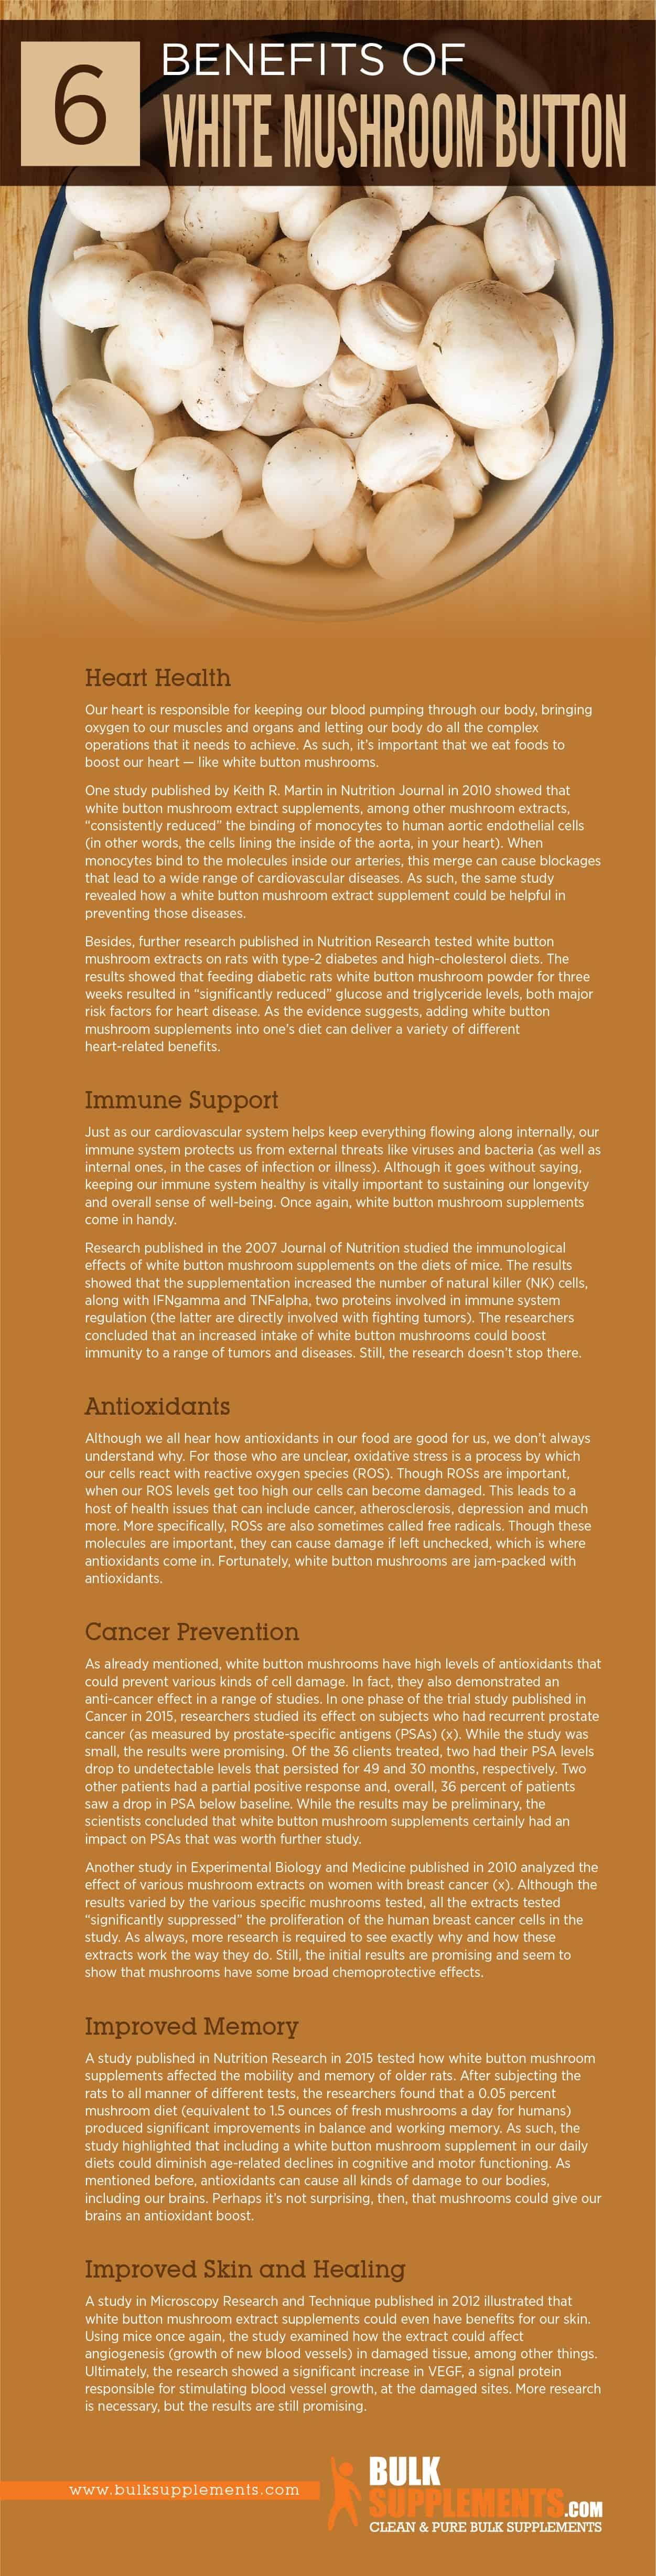 White Mushroom Button Benefits